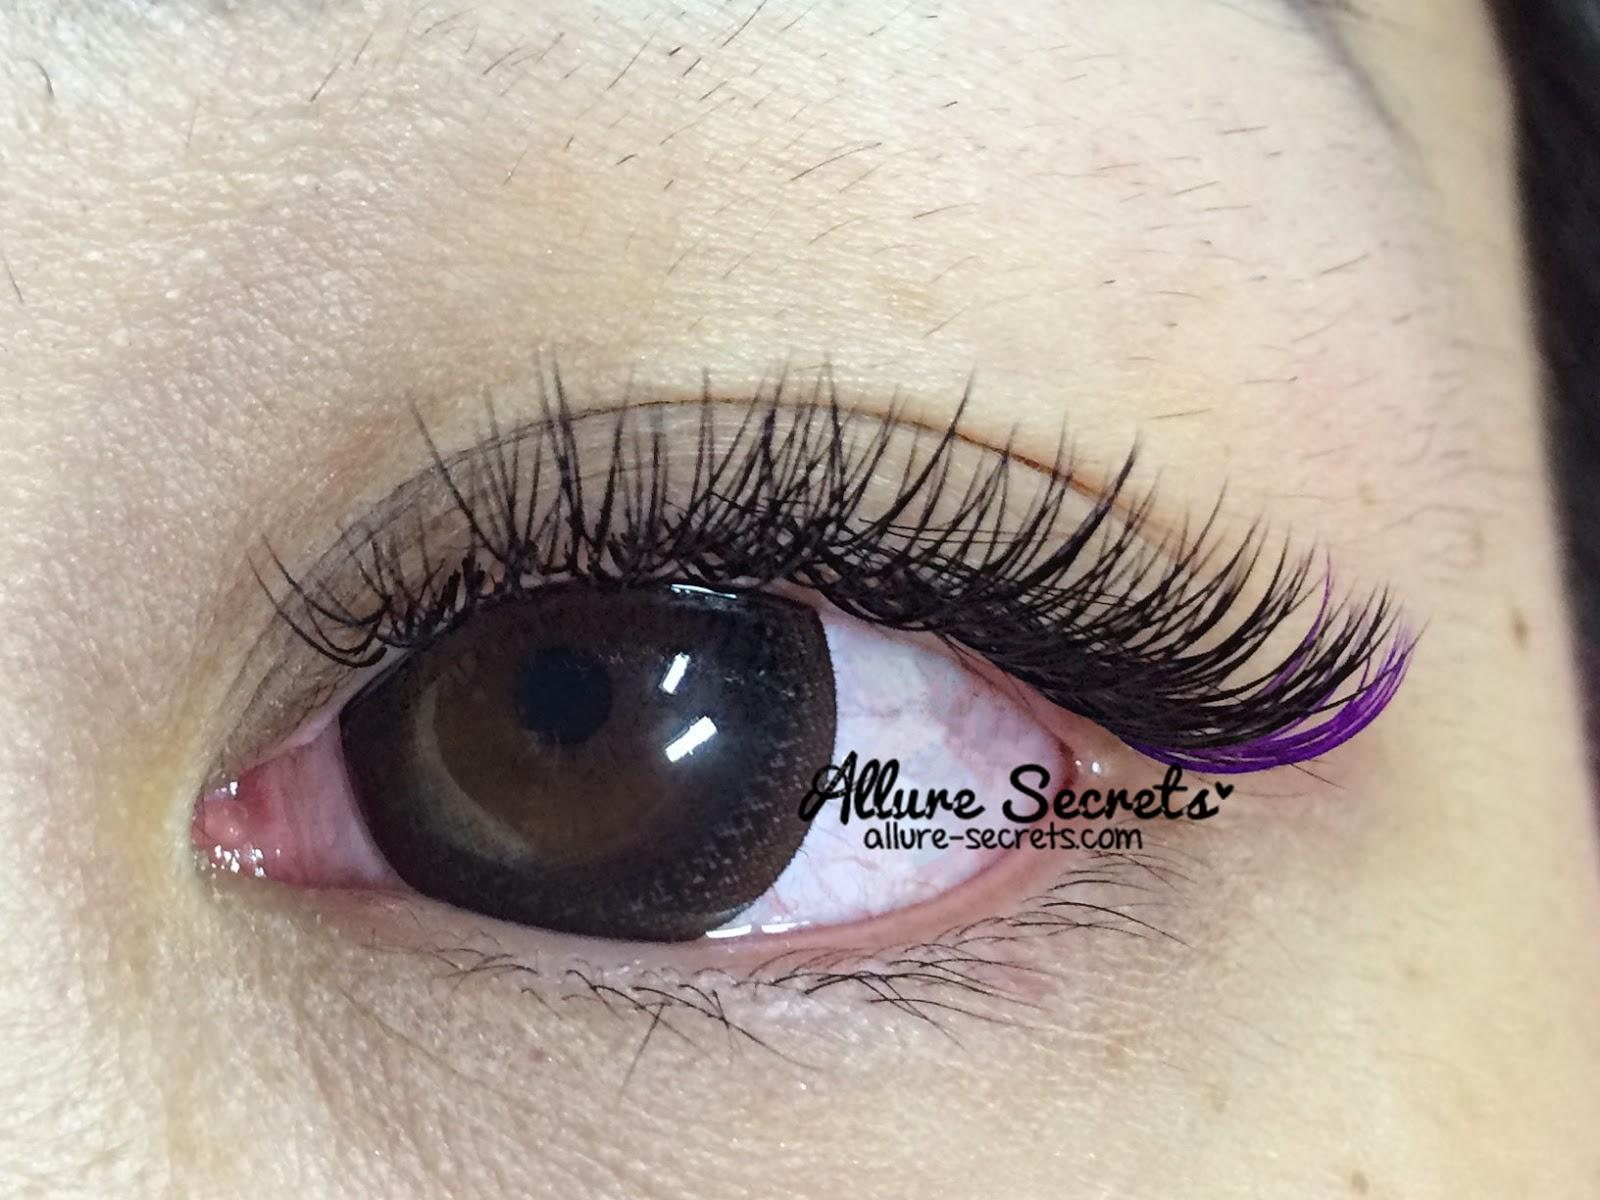 Allure Secrets - Professional Eyelash Extension in Singapore